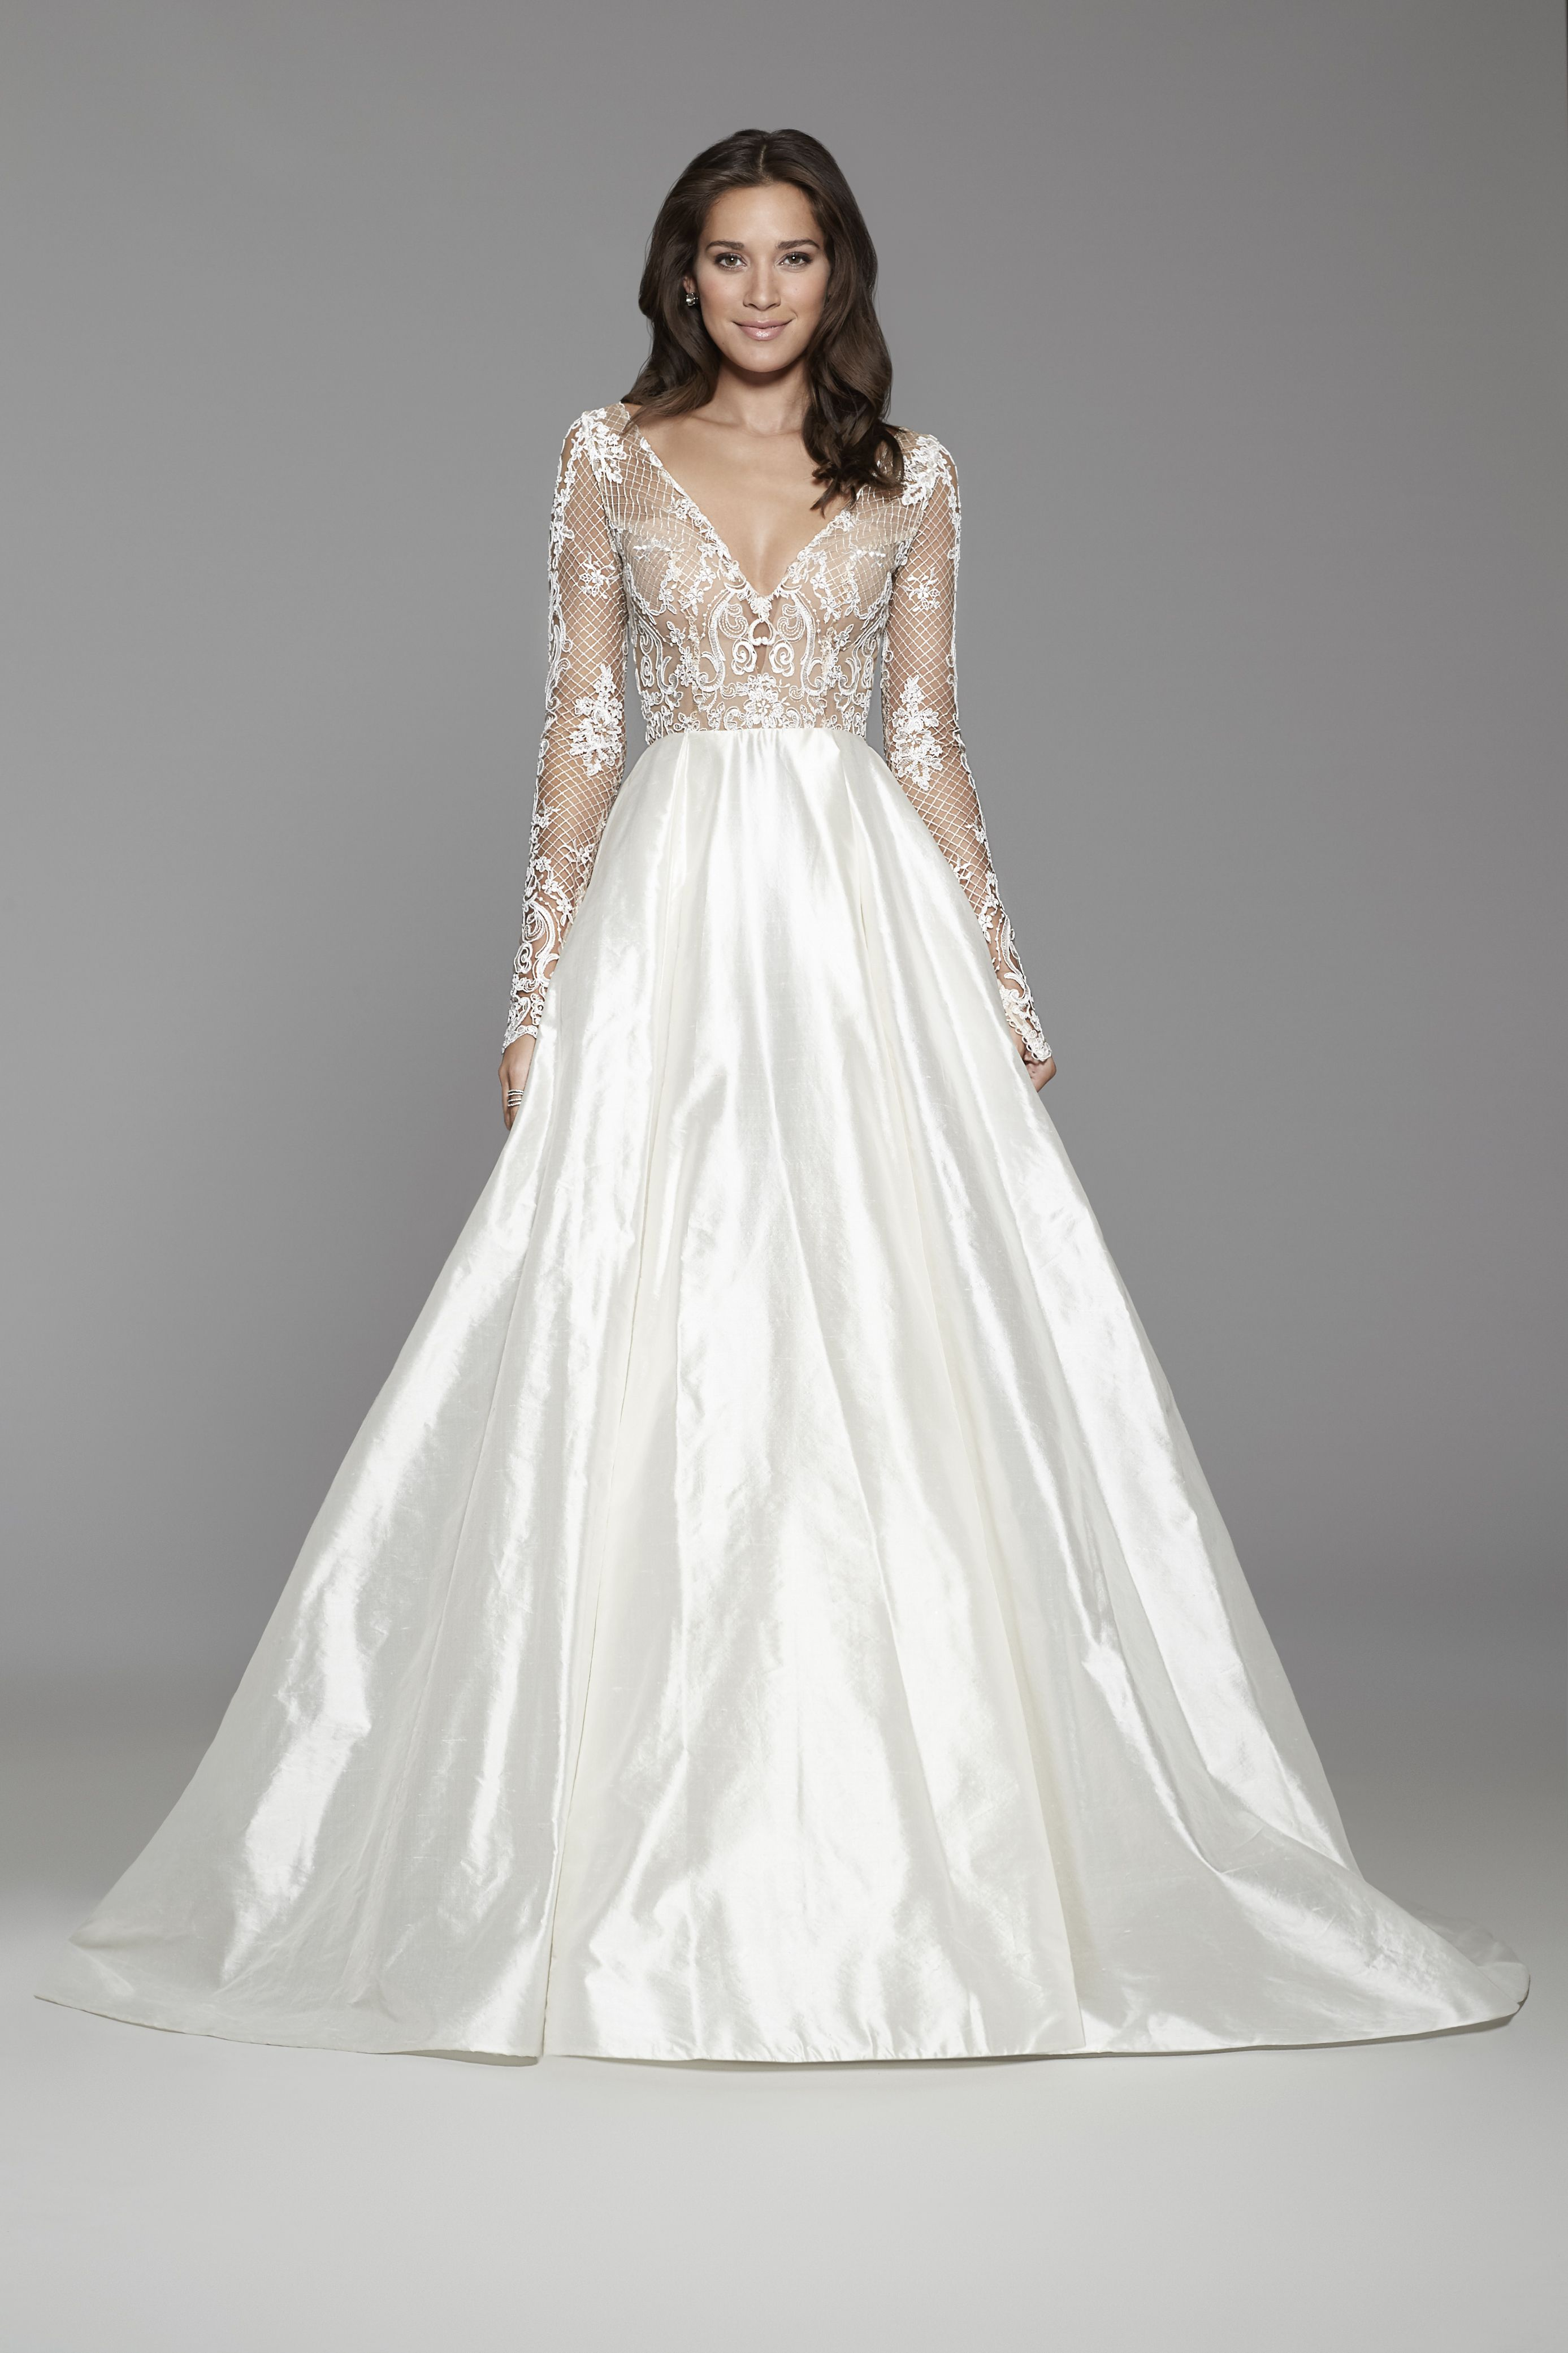 Tara Keely Bridal Style 2759 Ivory Silk Shantung Ball Gown